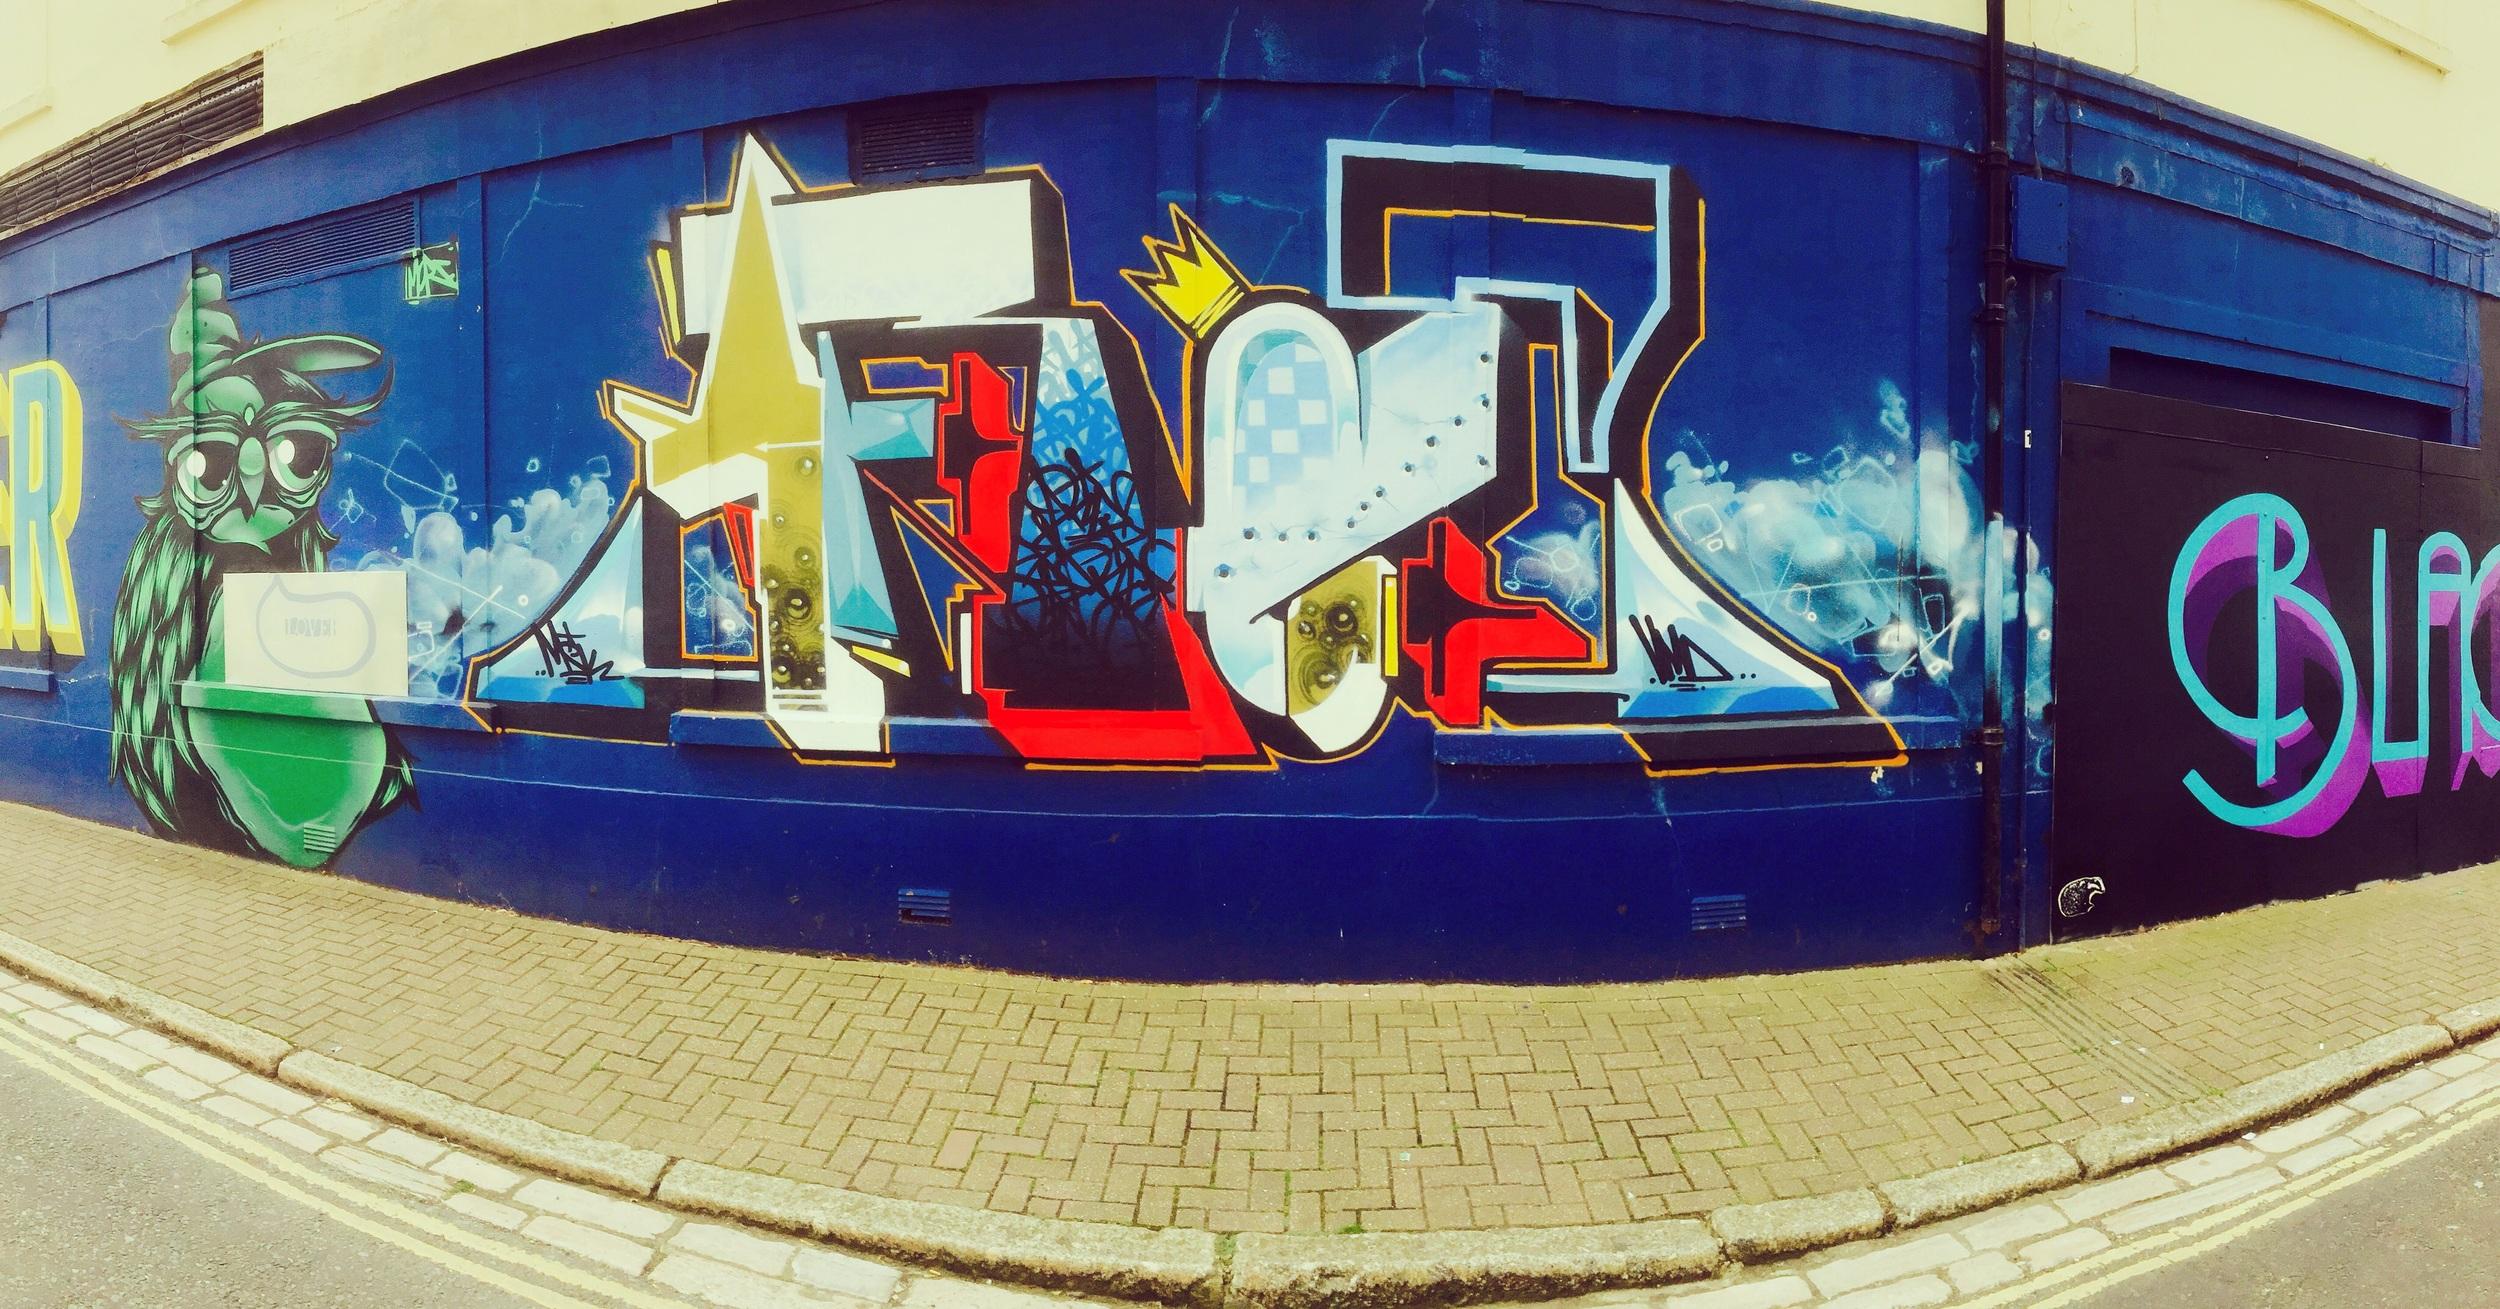 Wall art by MSK and Gary Stranger